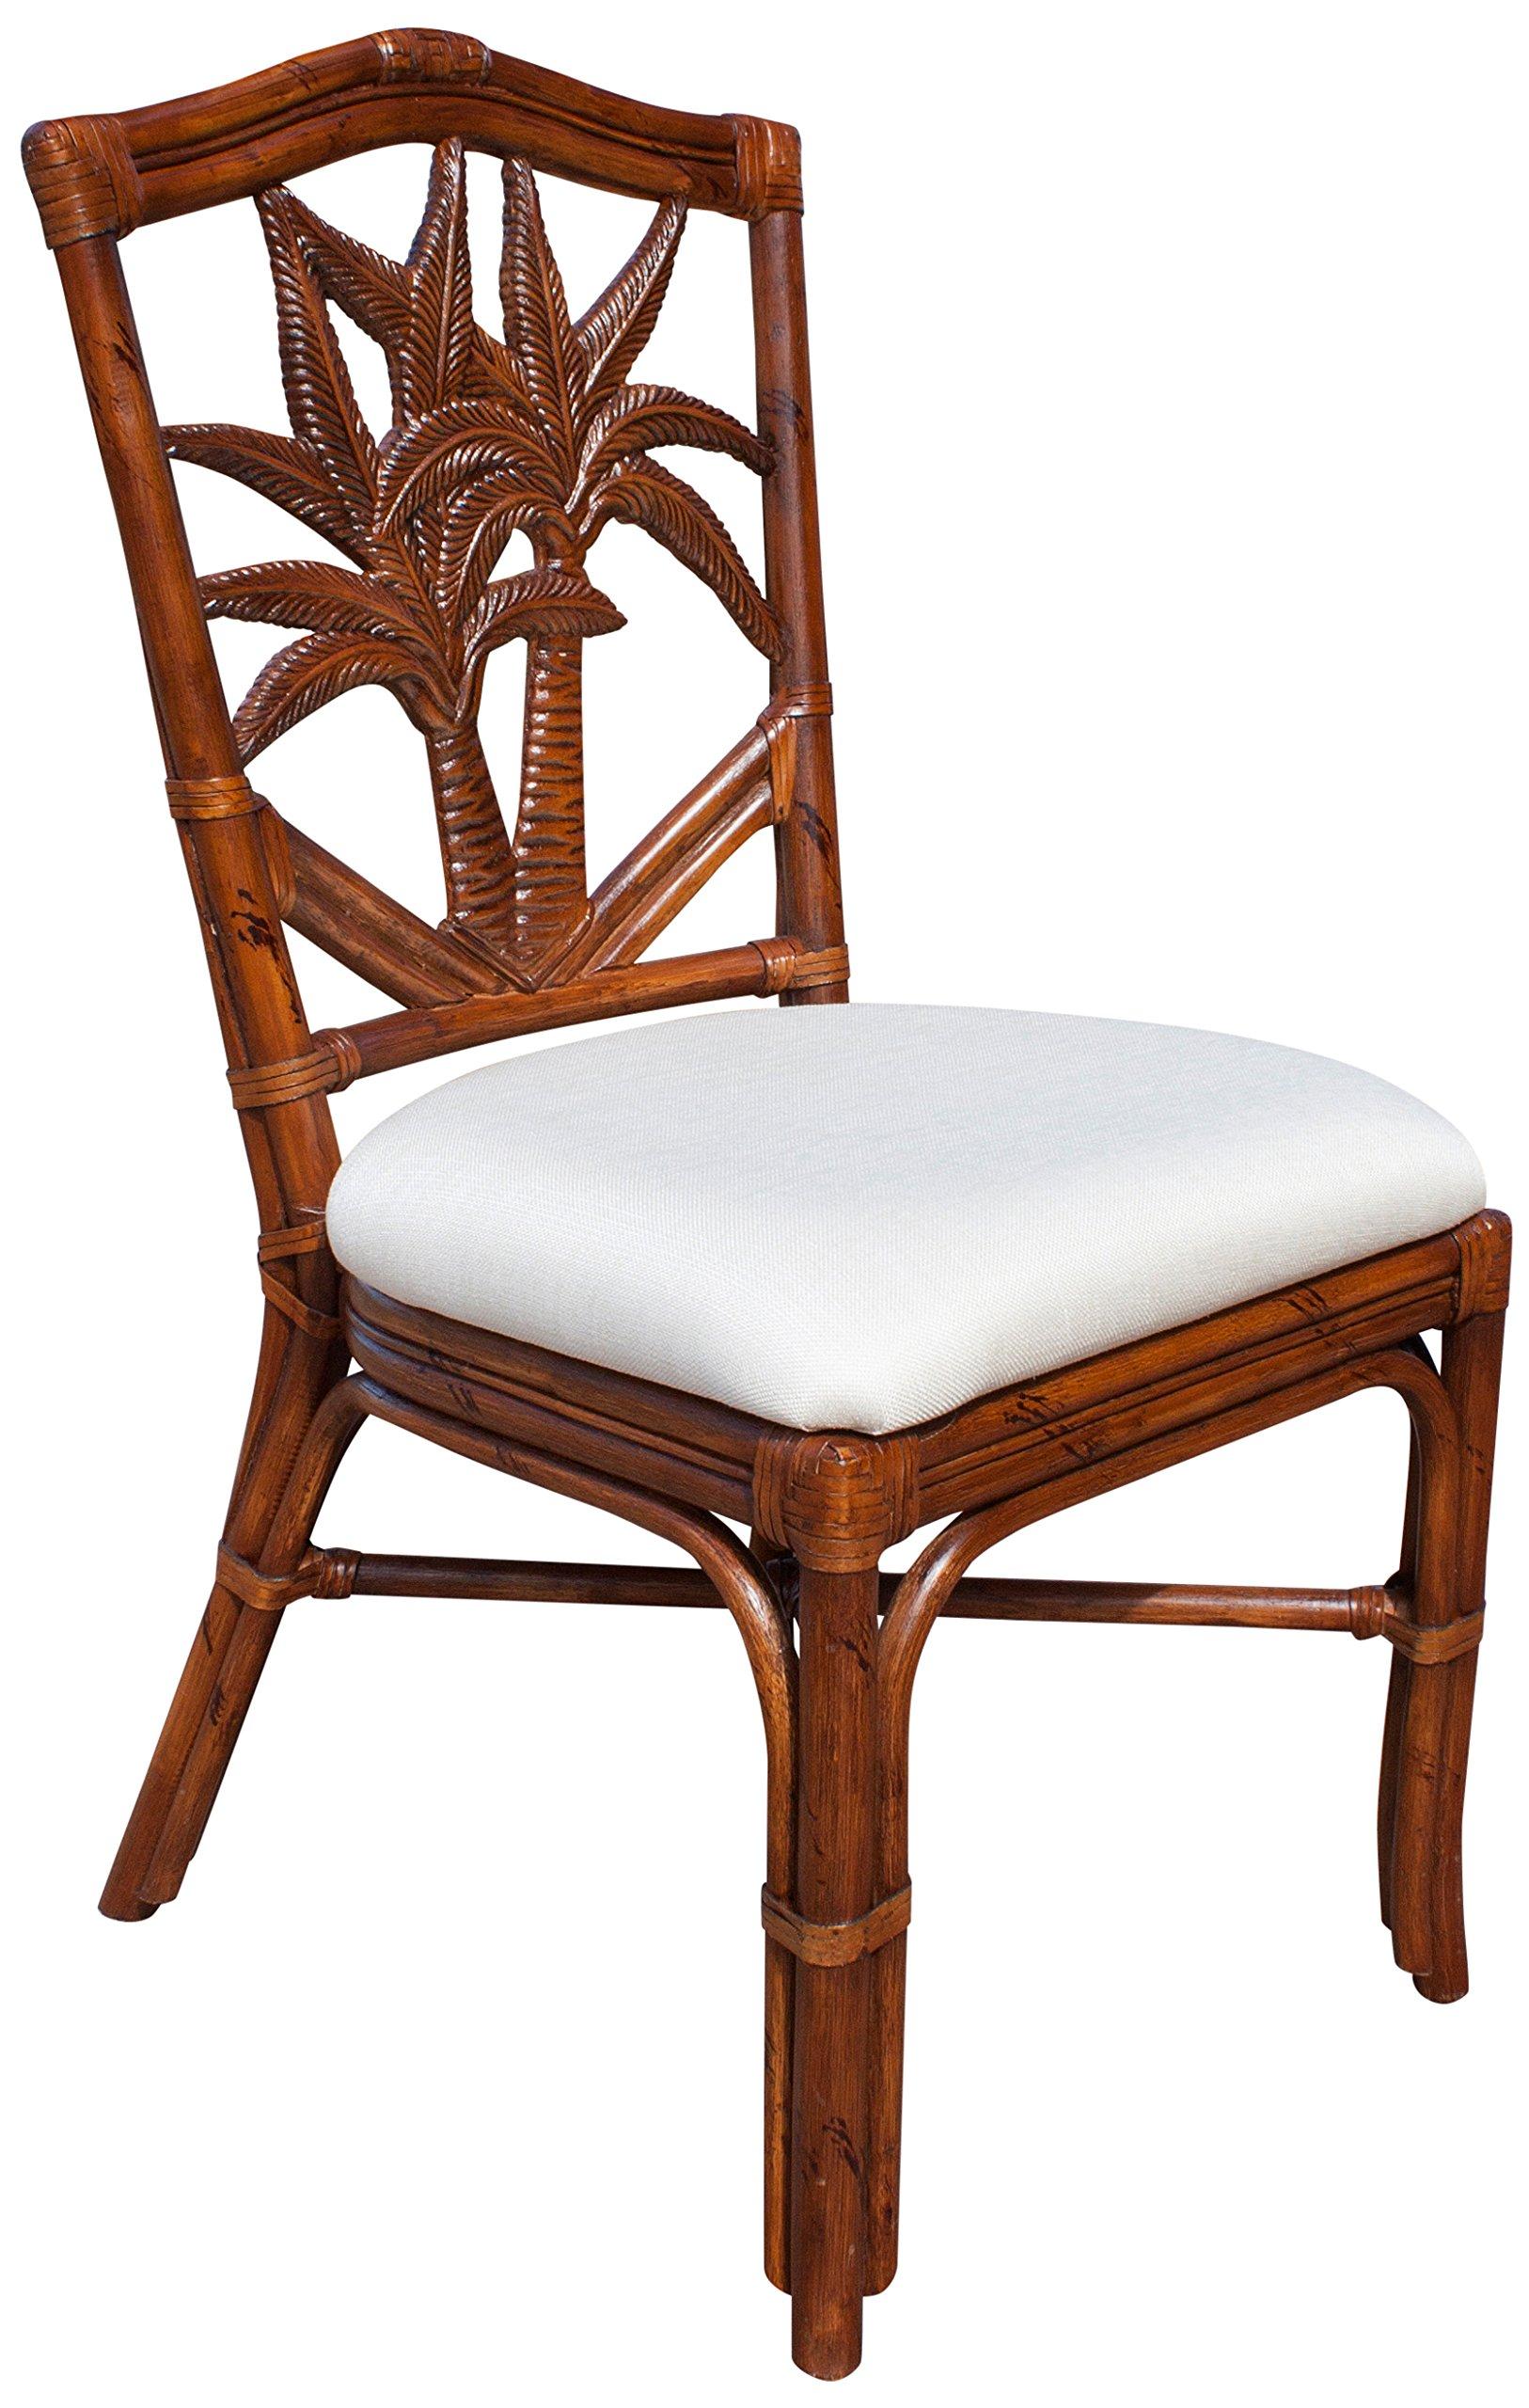 Hospitality Rattan 401-3370-TCA-S Cancun Palm Indoor Rattan & Wicker Side Chair, Sunbrella Canvas Spa